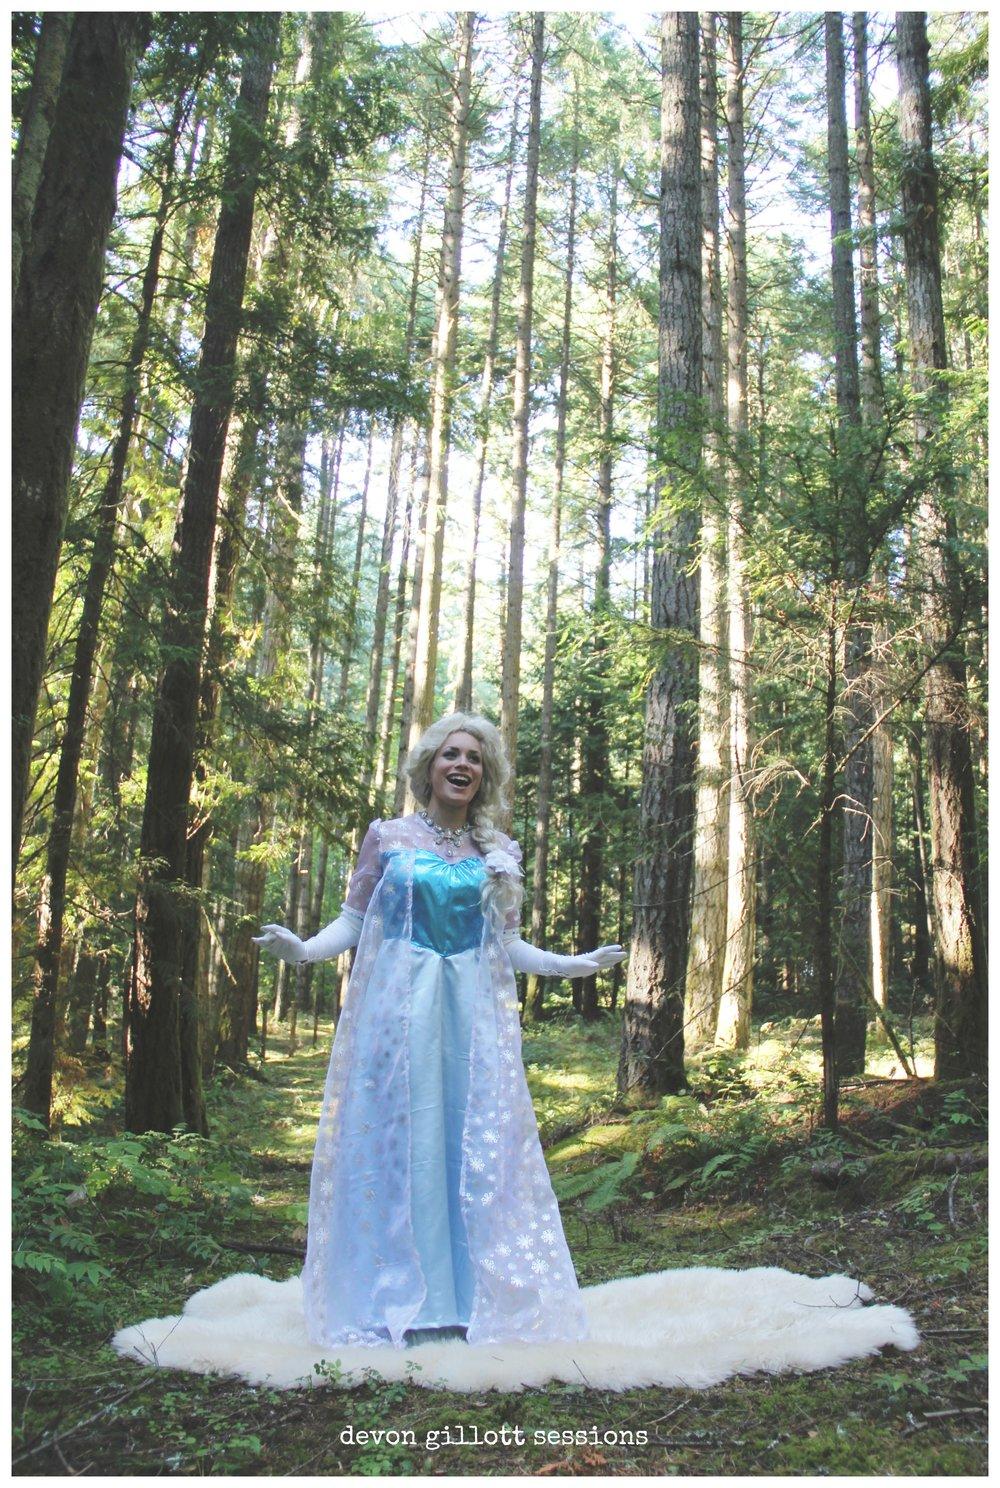 princesses_2014_09_04_9999_672.JPG